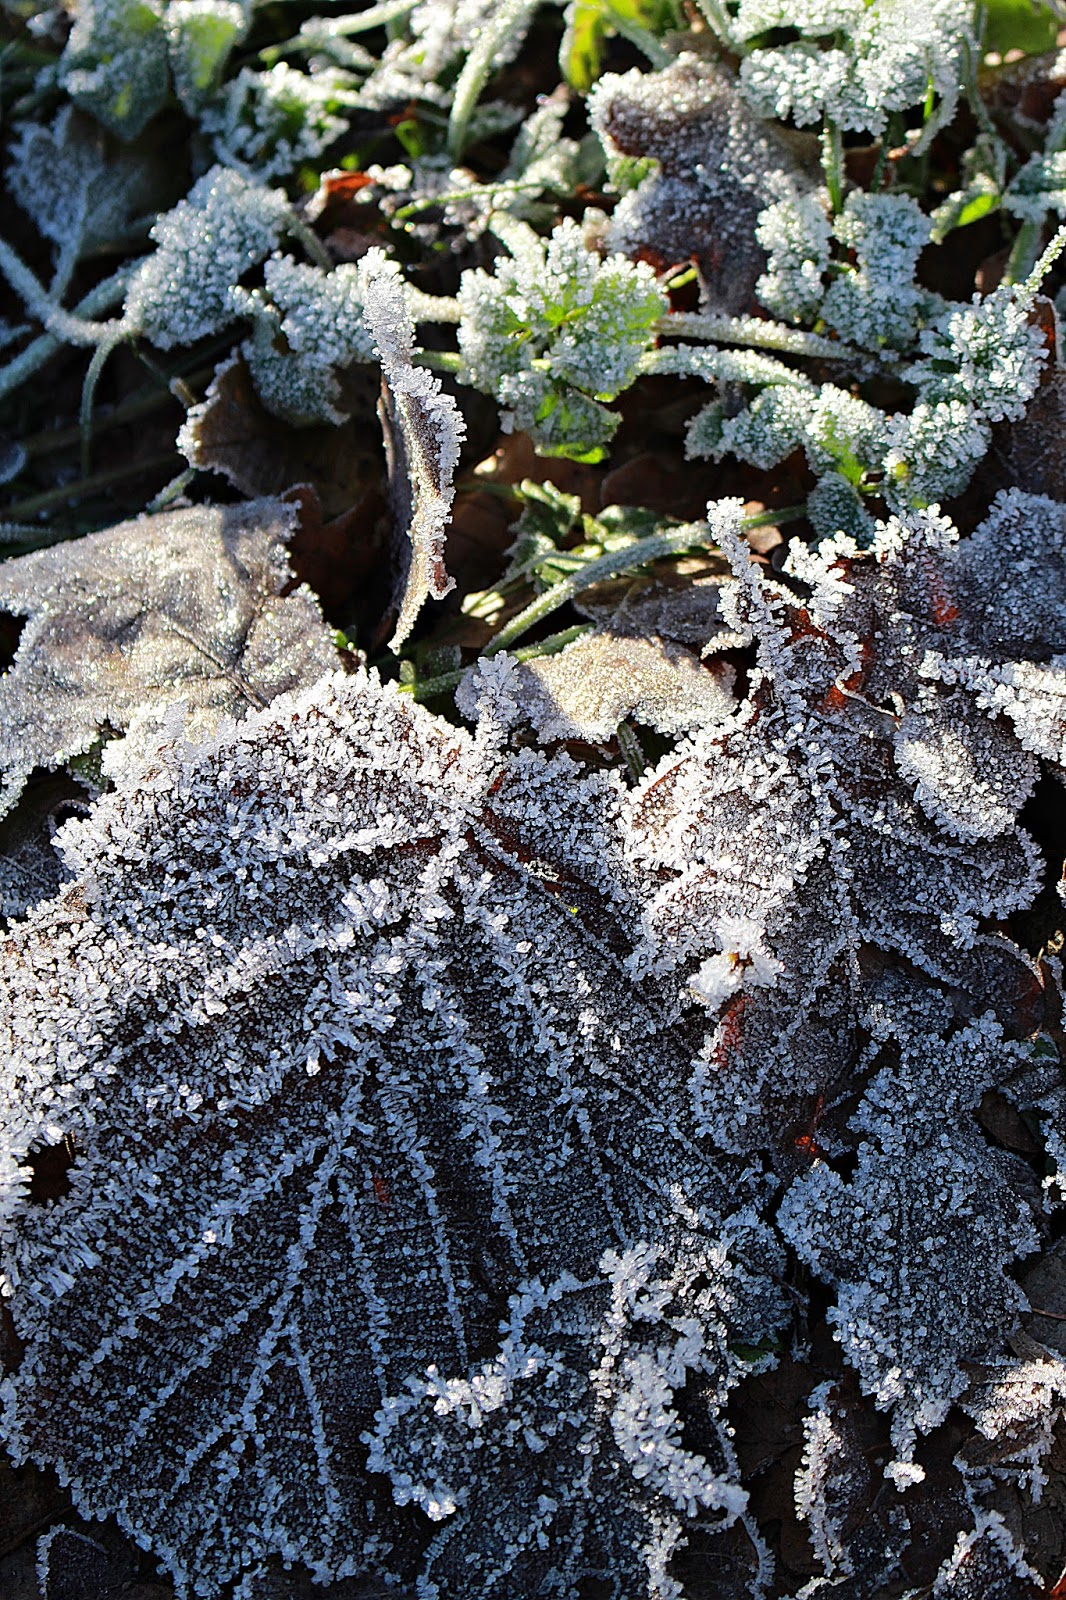 Der Frost Hat Bezaubernde Bilder Geschaffen. Winterblätter.